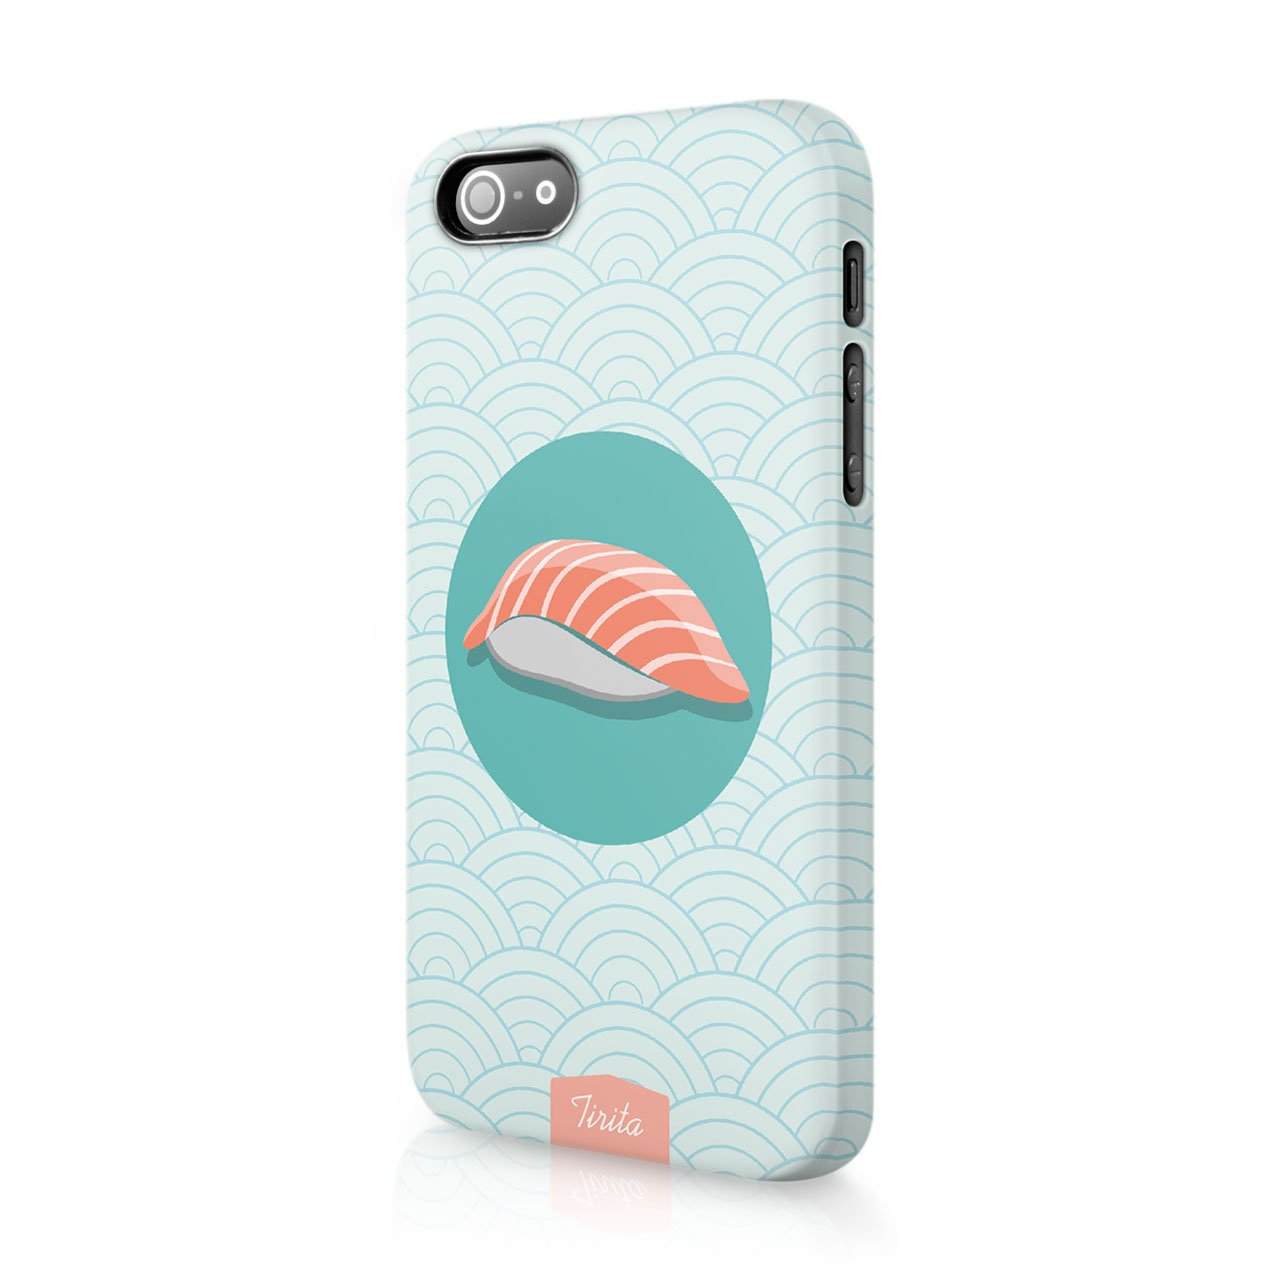 Iphone 5 / 5s / SE Tiritaハードケース電話カバー寿司和食日本流行ファッションギフトプレゼントキュートなデザイン   B01N6WE7DR